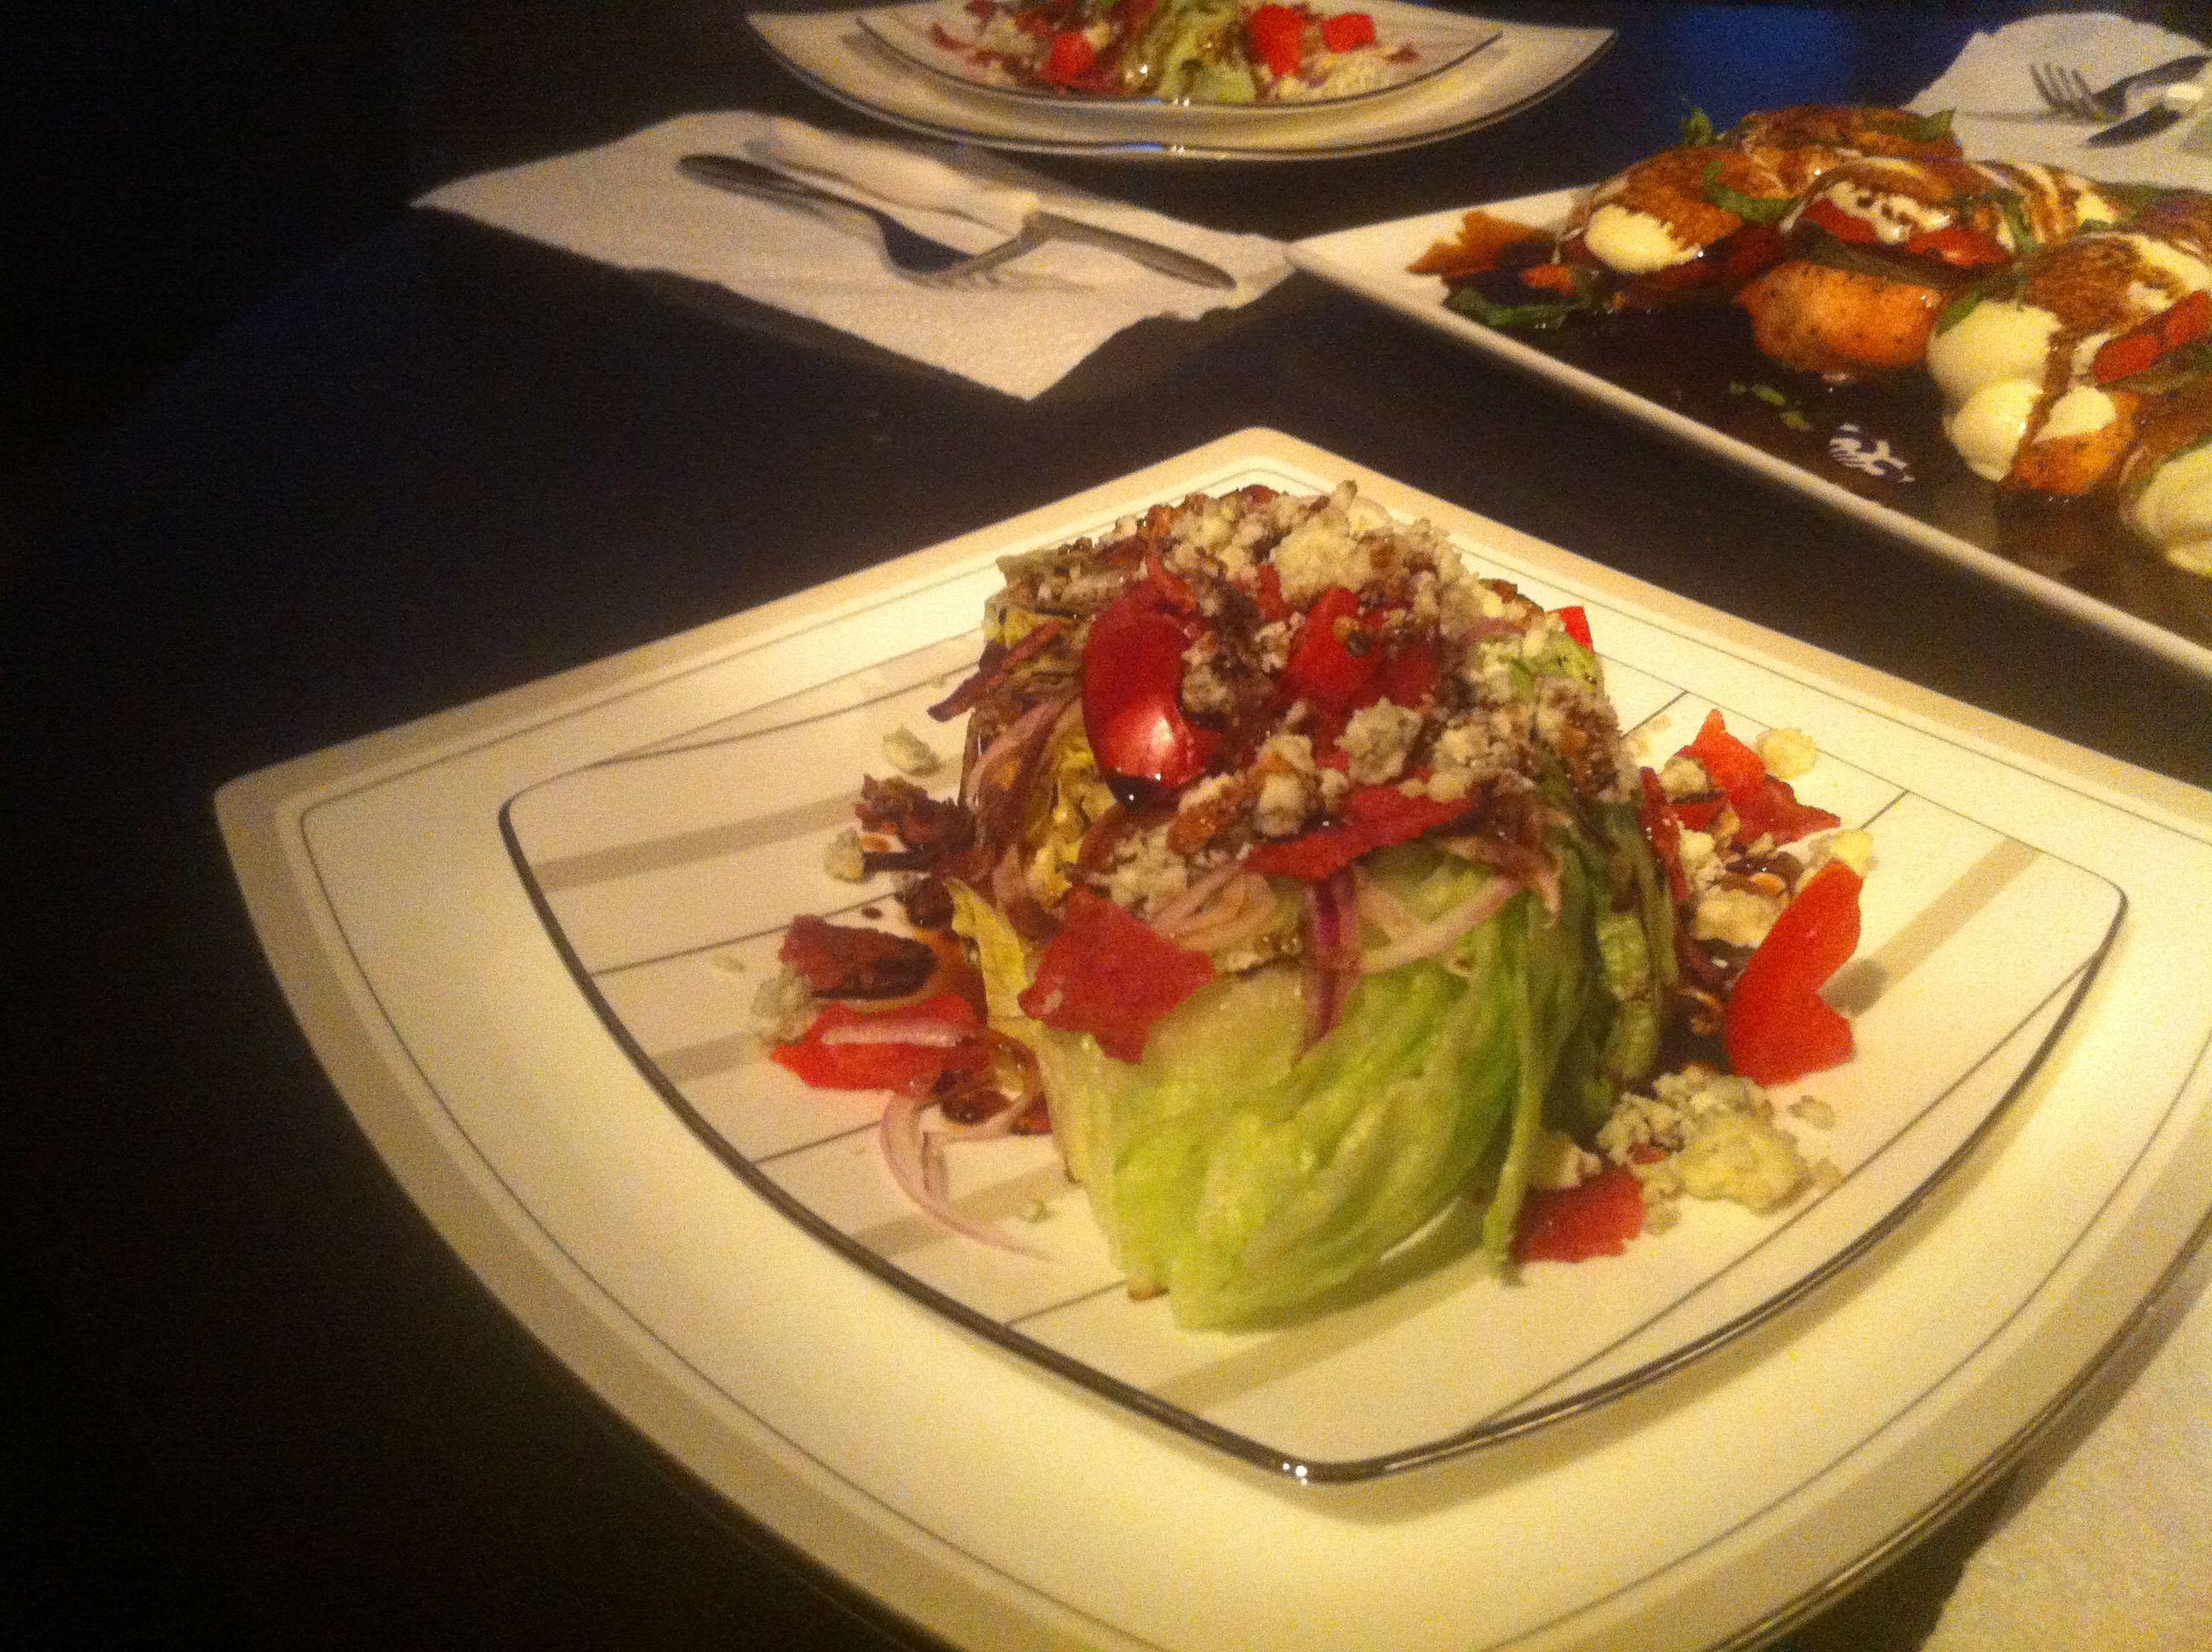 Blue cheese wedge salad. Yum!!